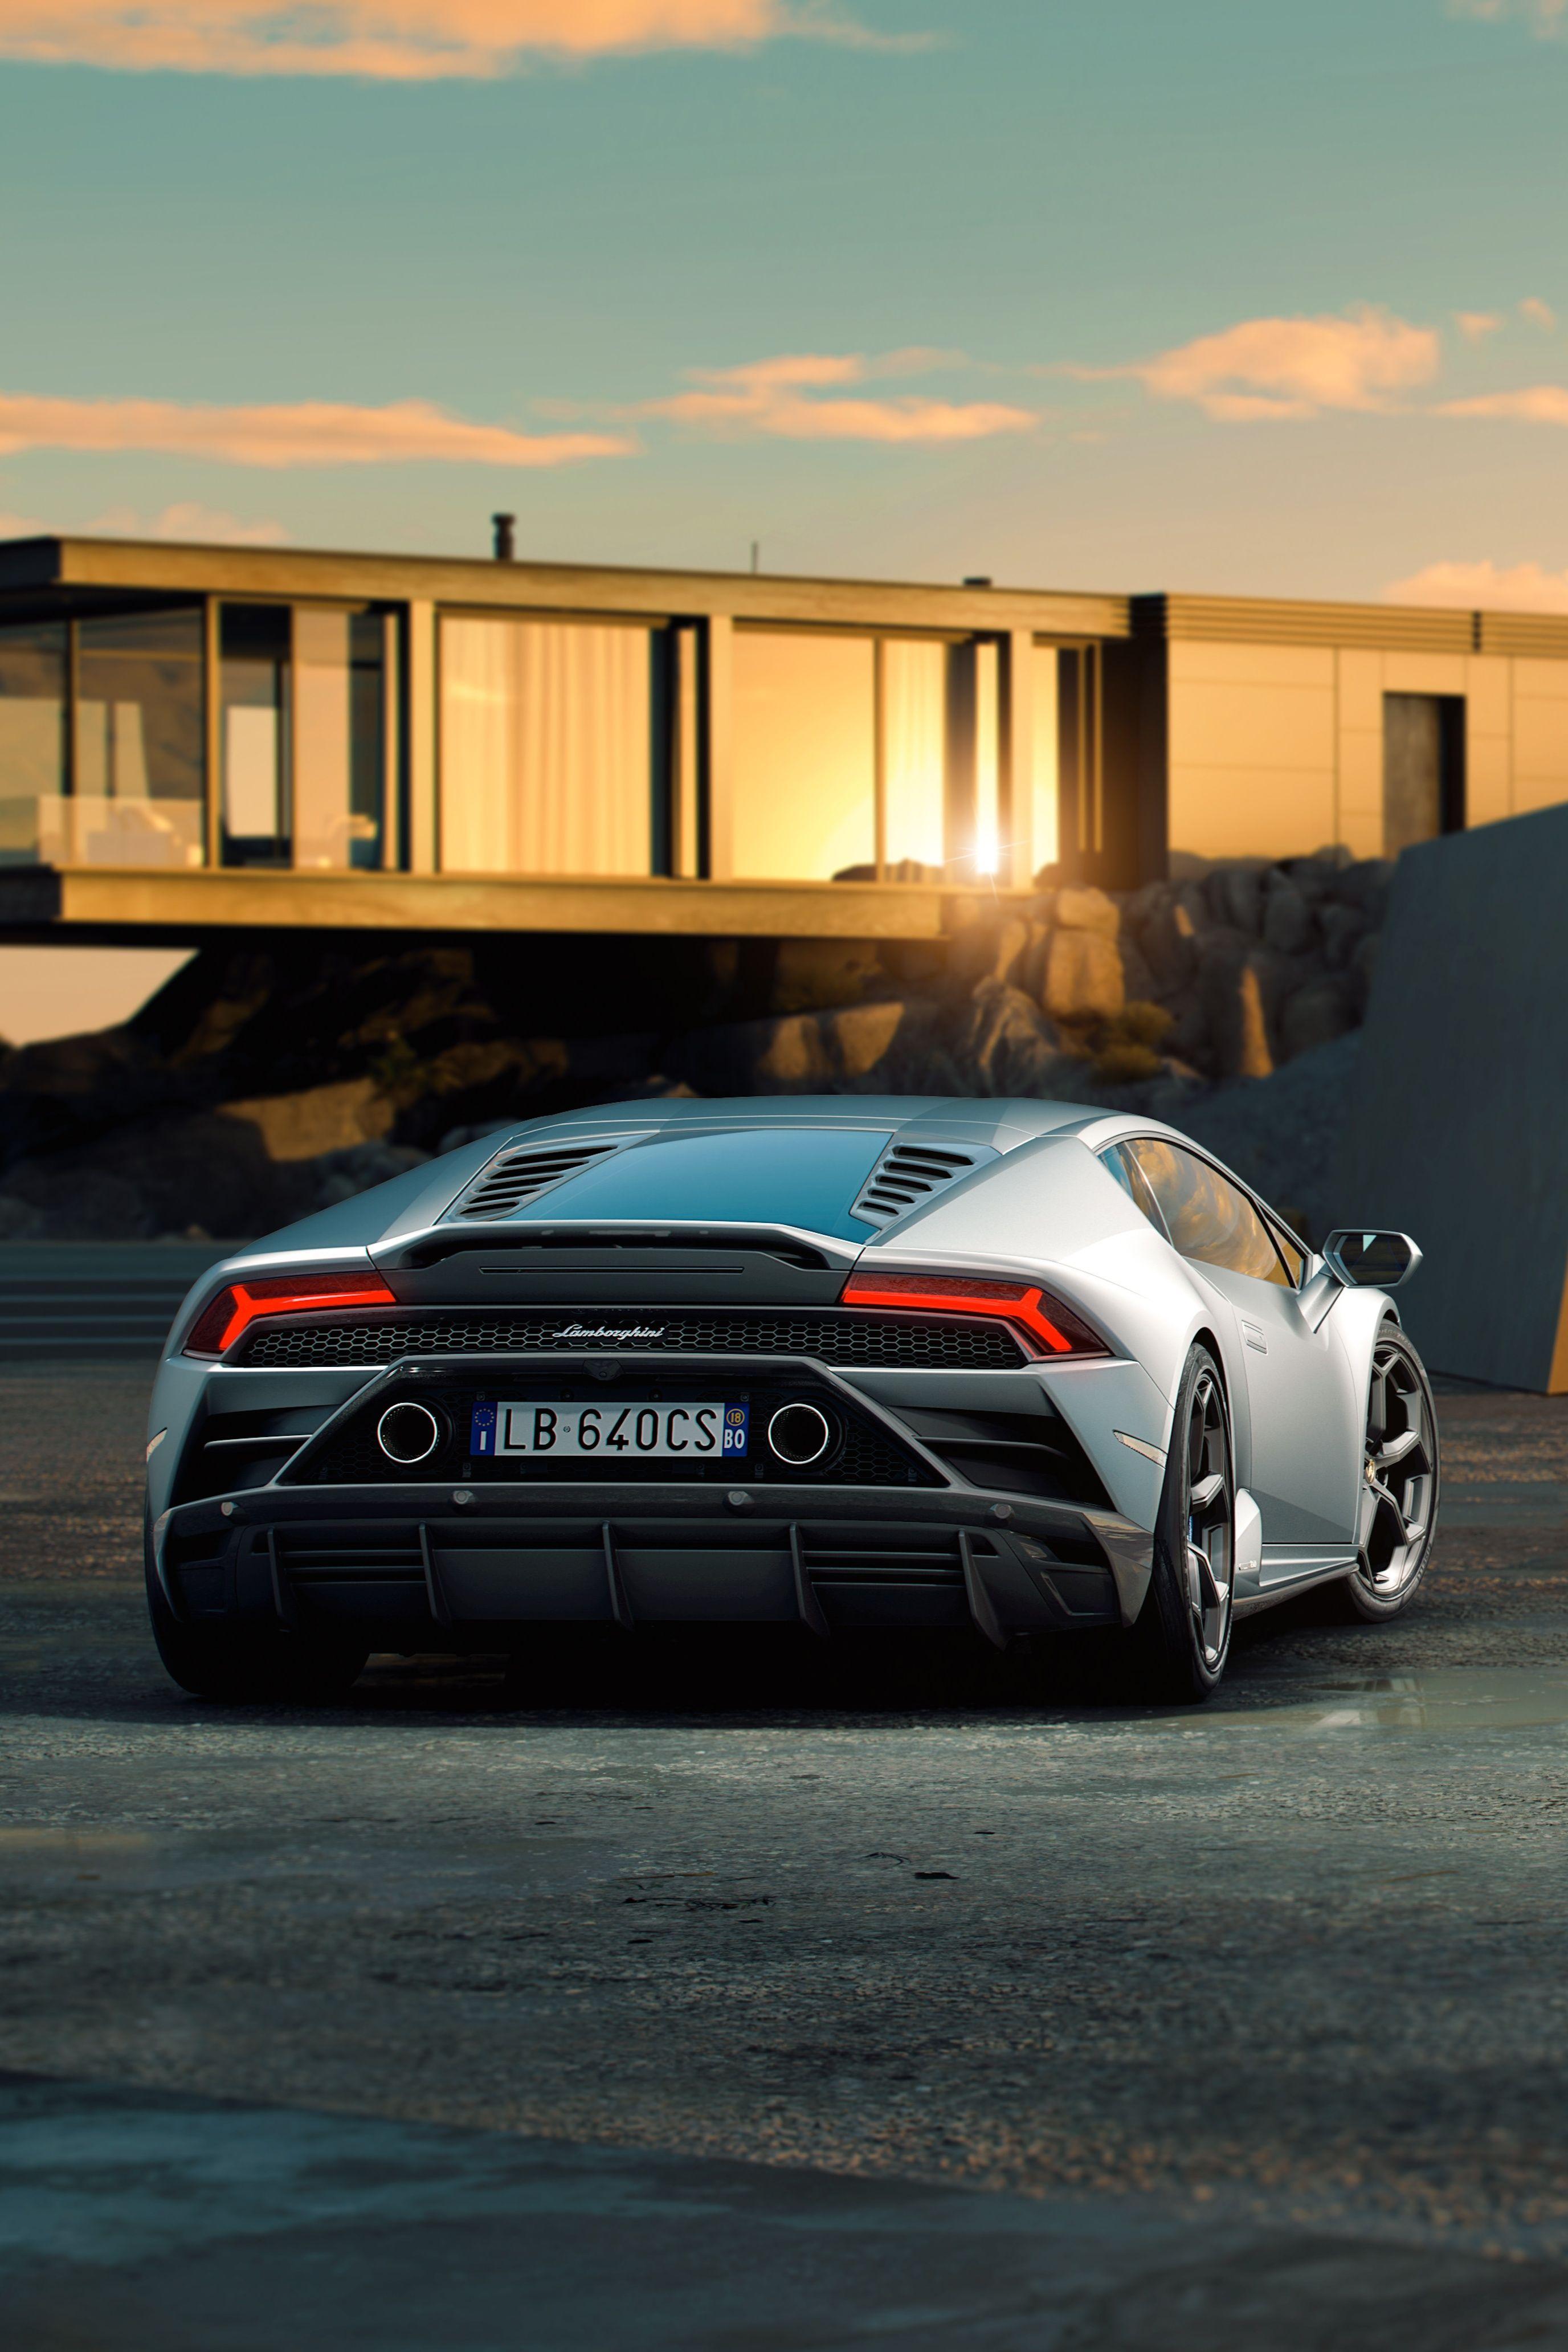 2019 Lamborghini Huracan Evo Sports Cars Lamborghini Lamborghini Cars Sports Cars Luxury